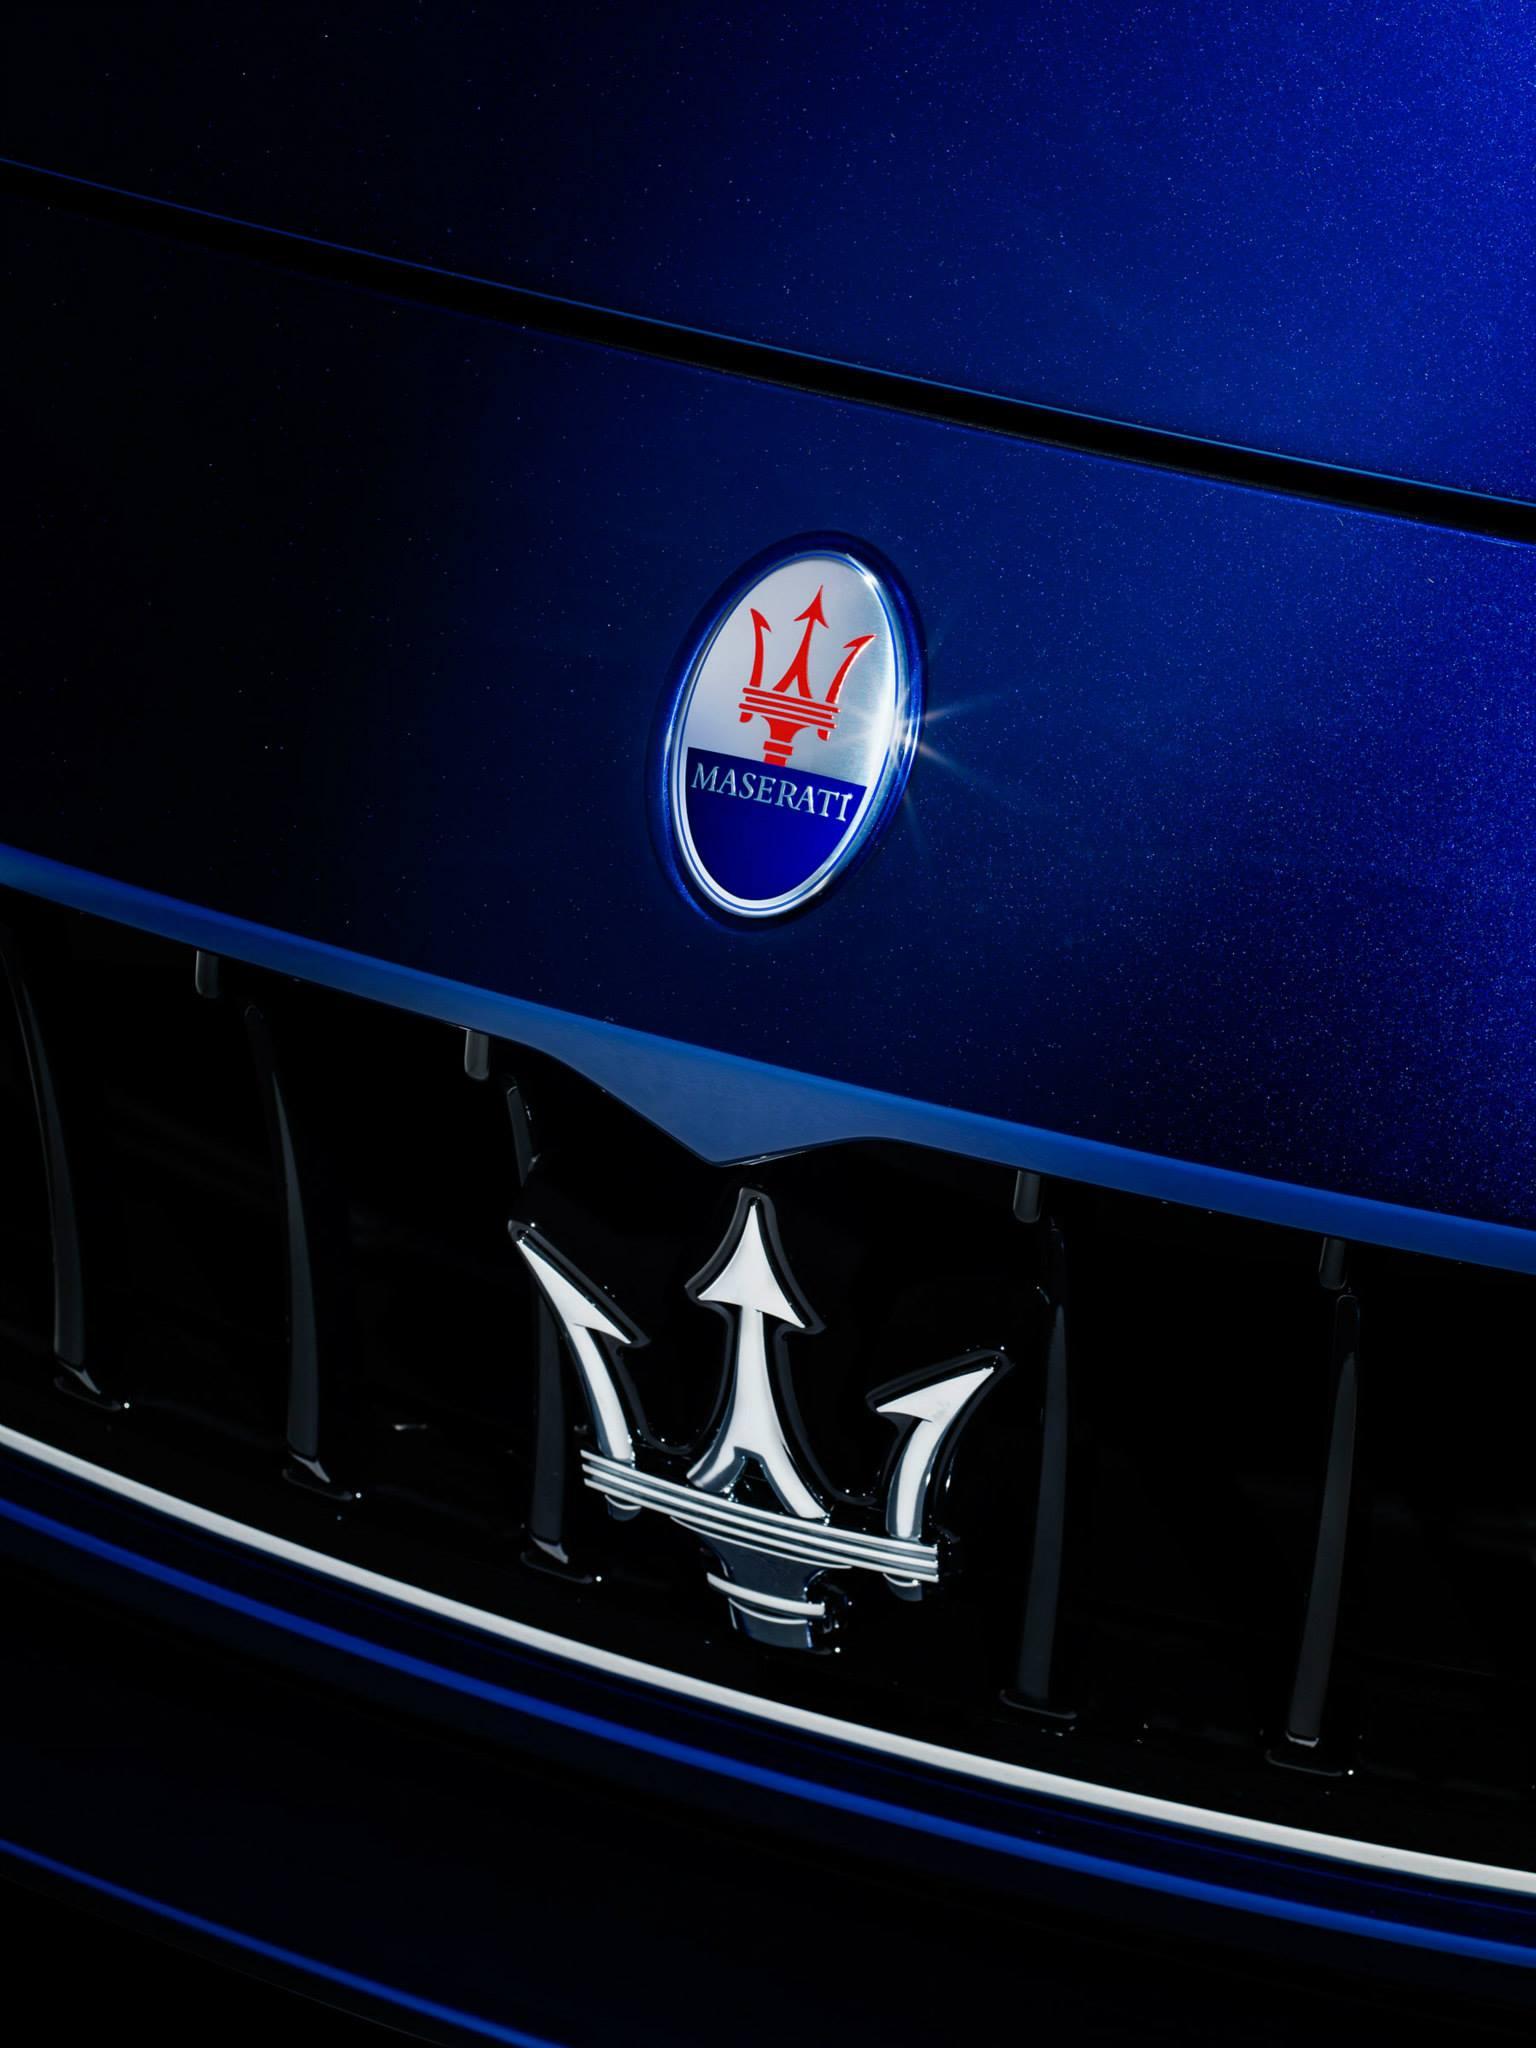 2014 Maserati Ghibli Looks Stunning In Blu Emozione